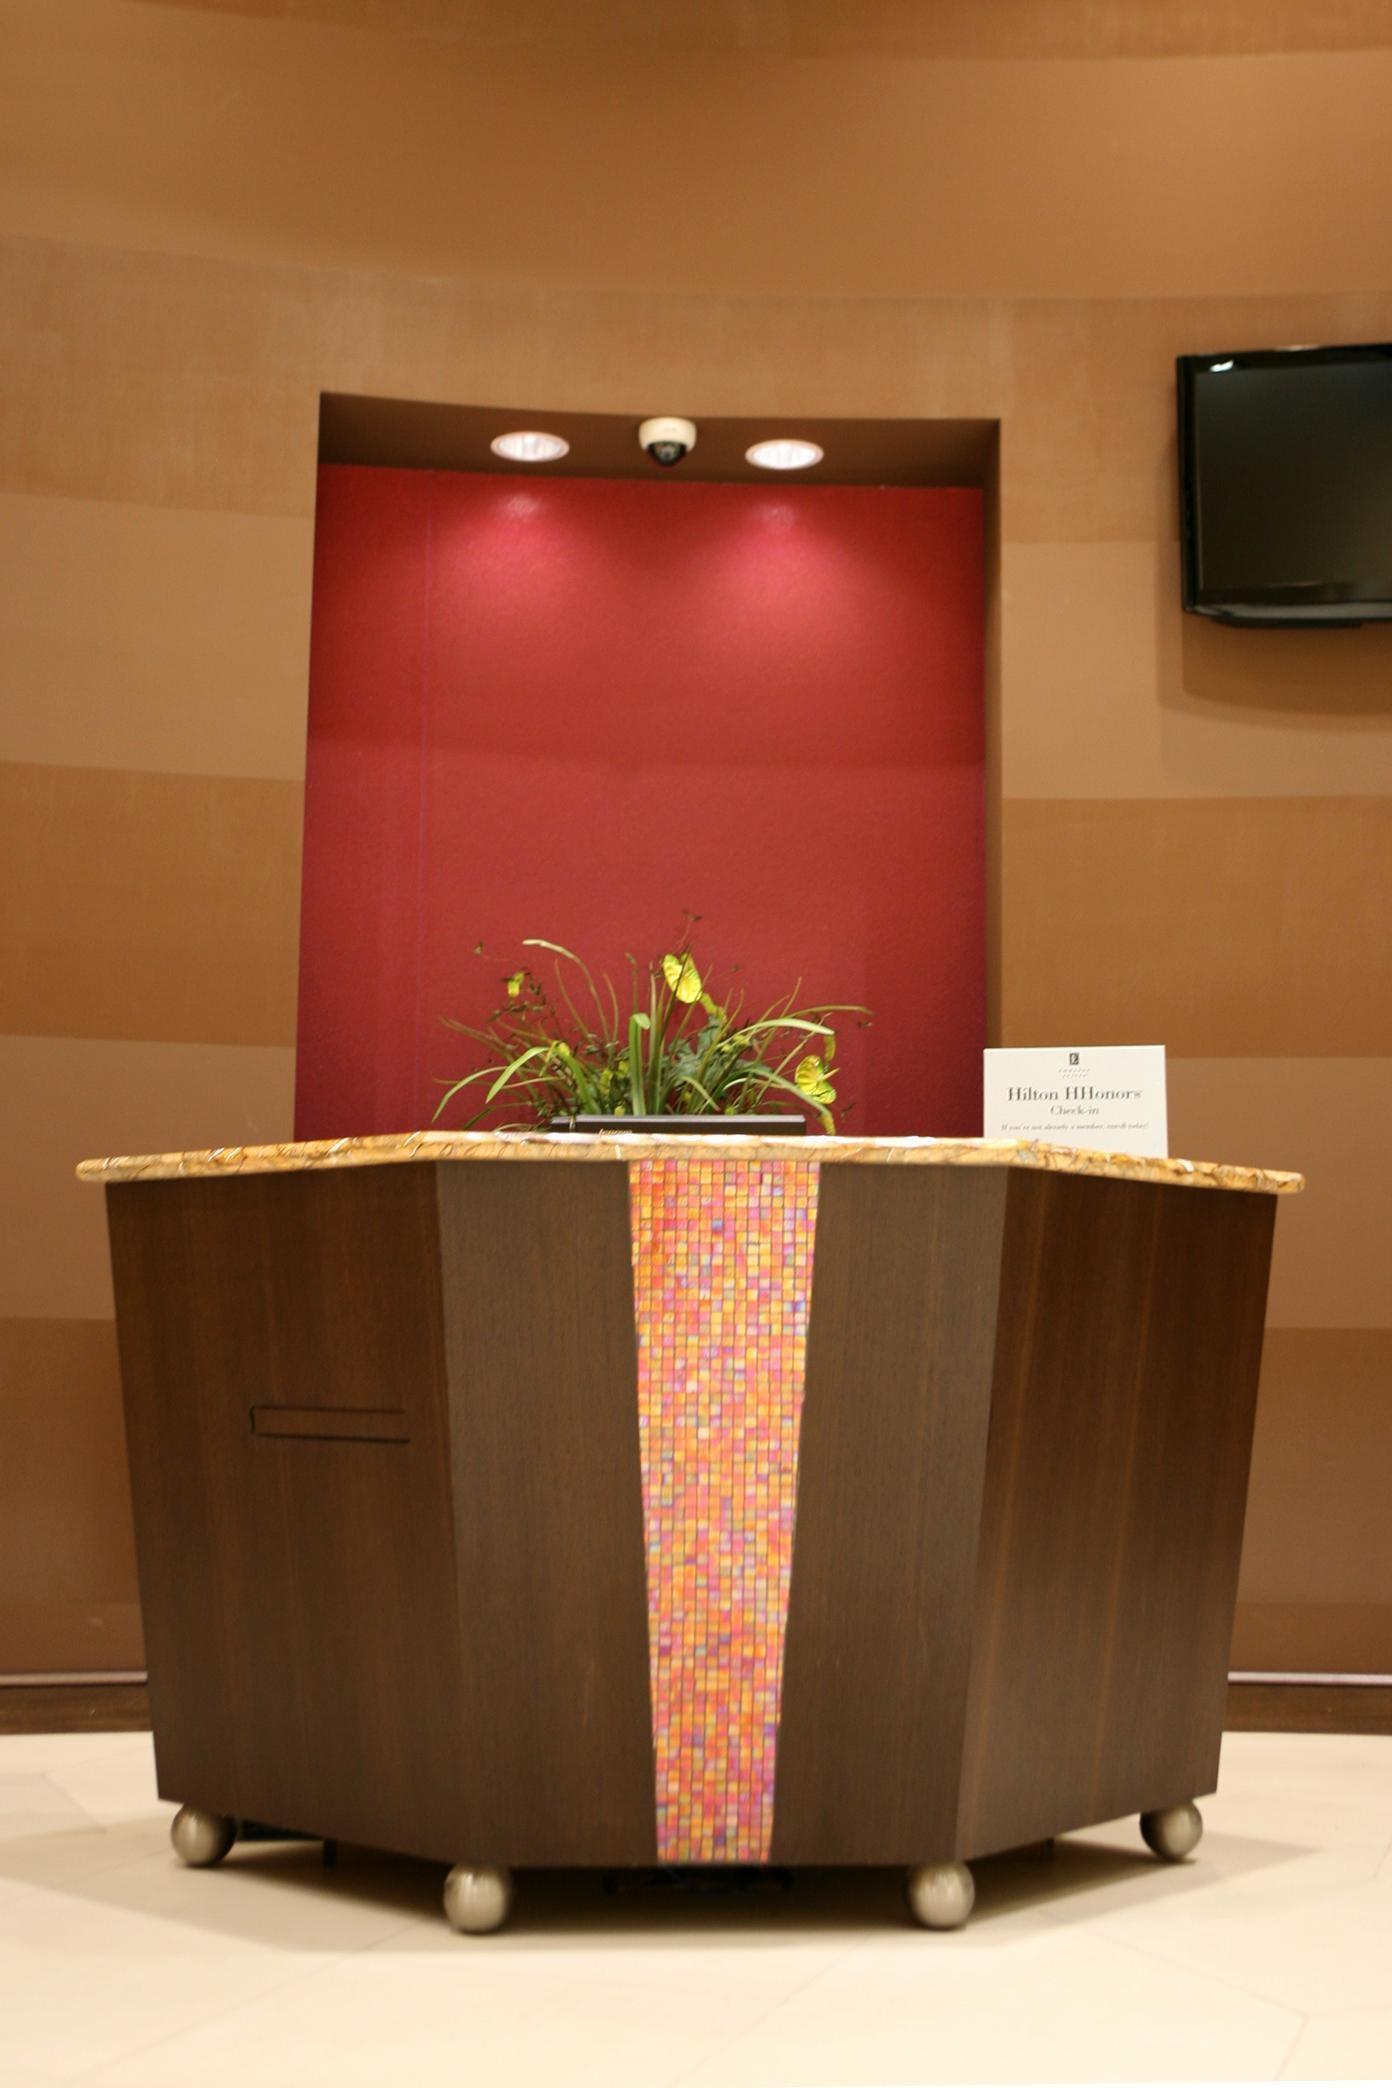 Embassy Suites by Hilton Birmingham Hoover image 7